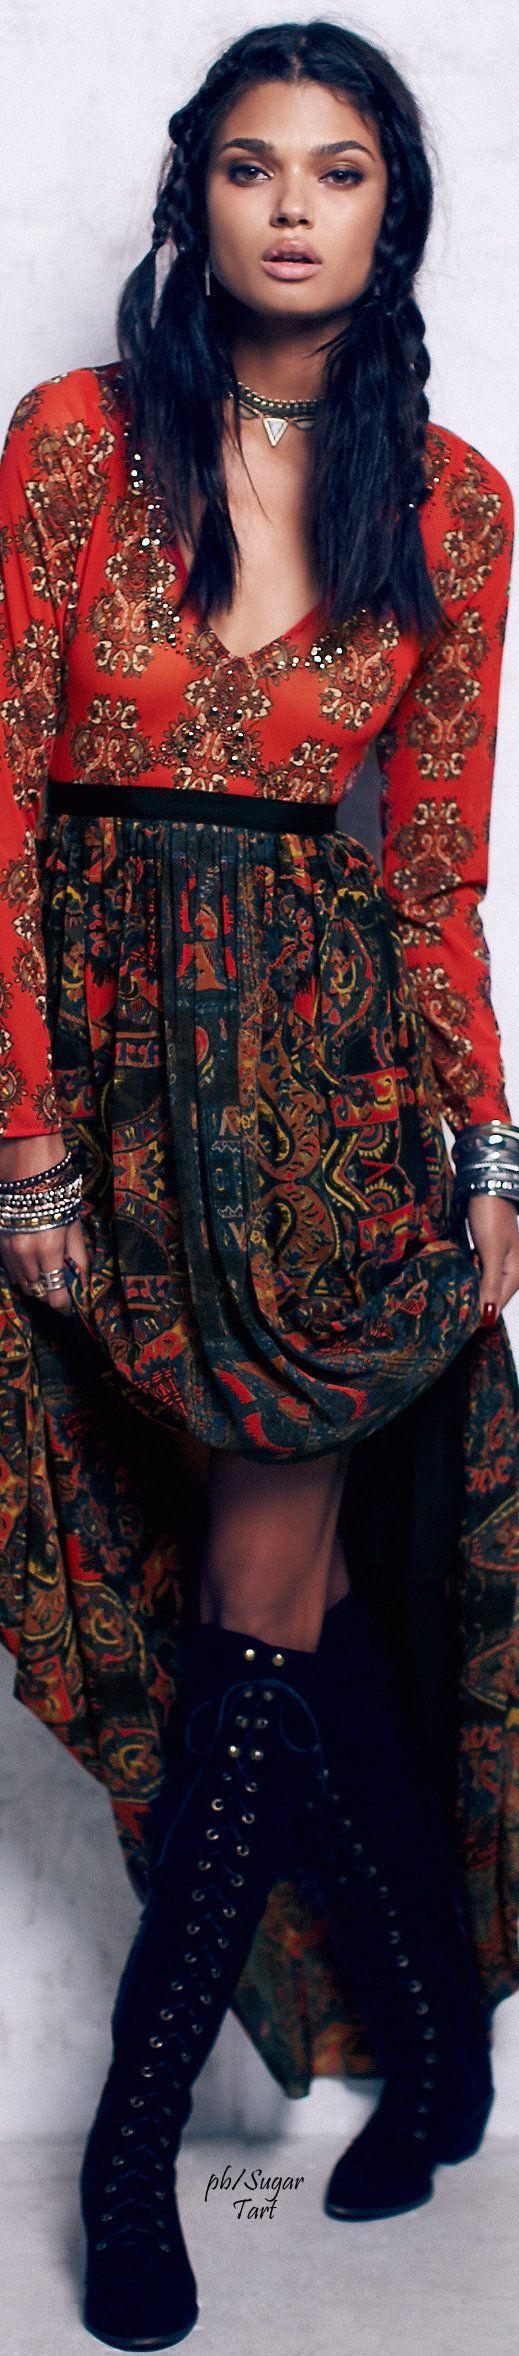 ♥ my designs? http://TatianaAndrade.com ↣✧❂✧ TatiTati Style ✧❂✧↢ Love the color/pattern in this Boho dress! See innovative designs! http://www.tatianaandrade.com